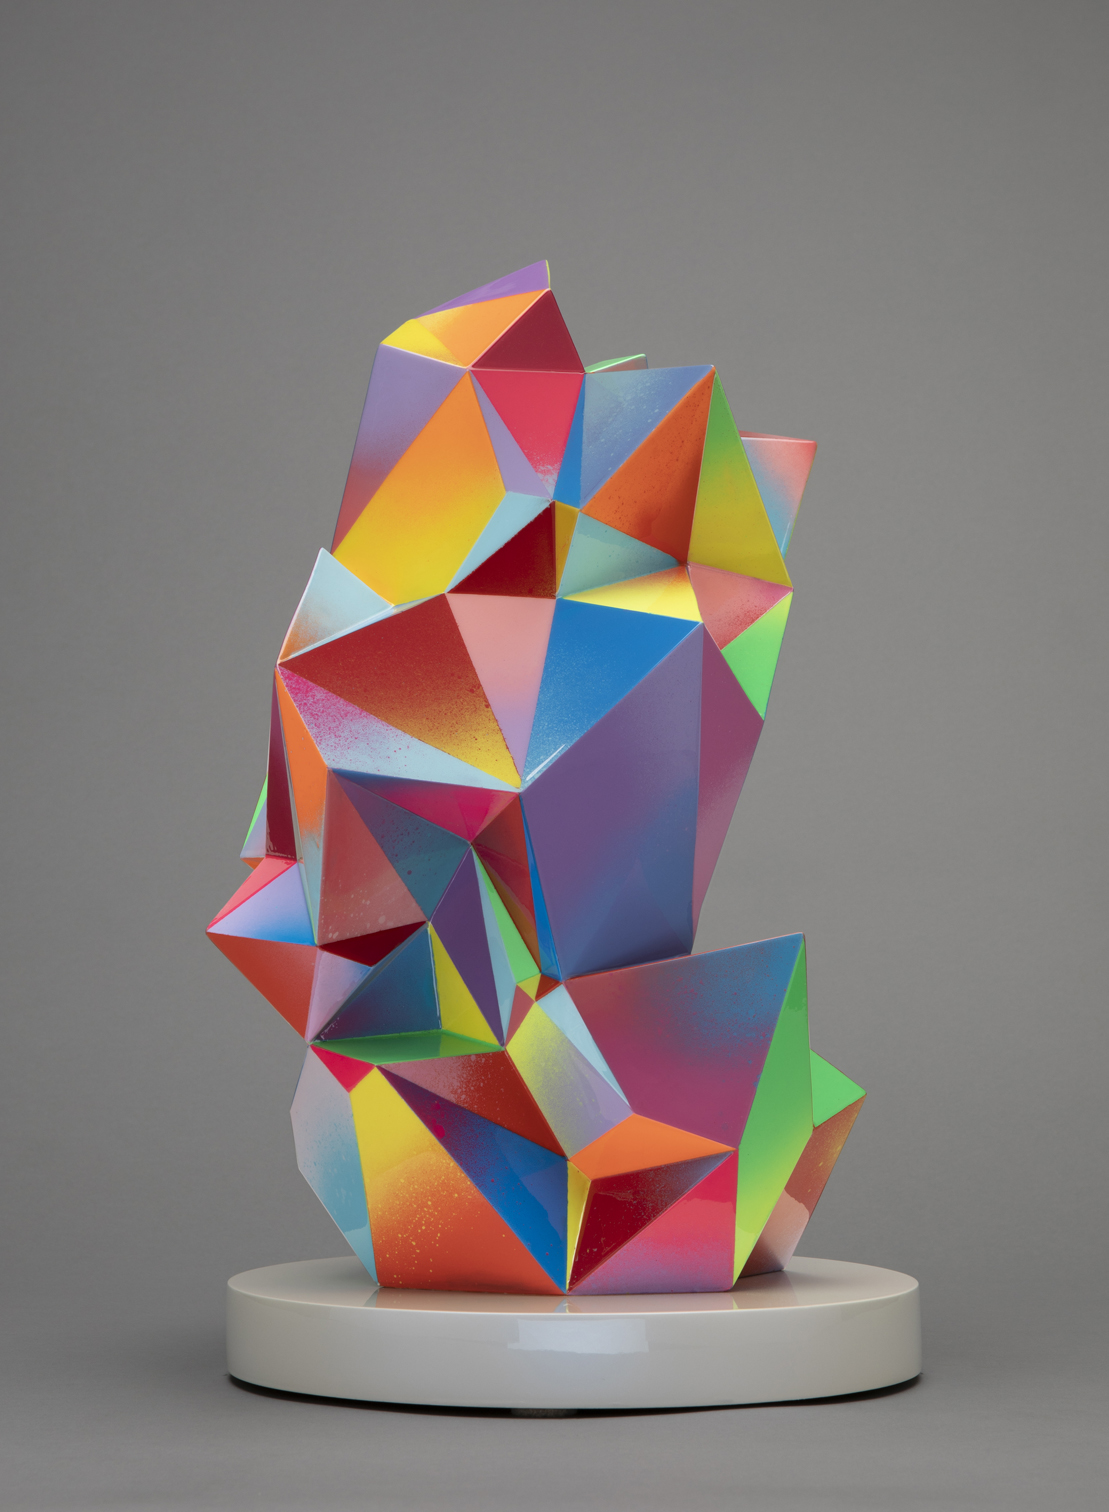 Jud-18-11-03-colored-sculpture_02-view 3-HERO-212-WIP-01a.jpg